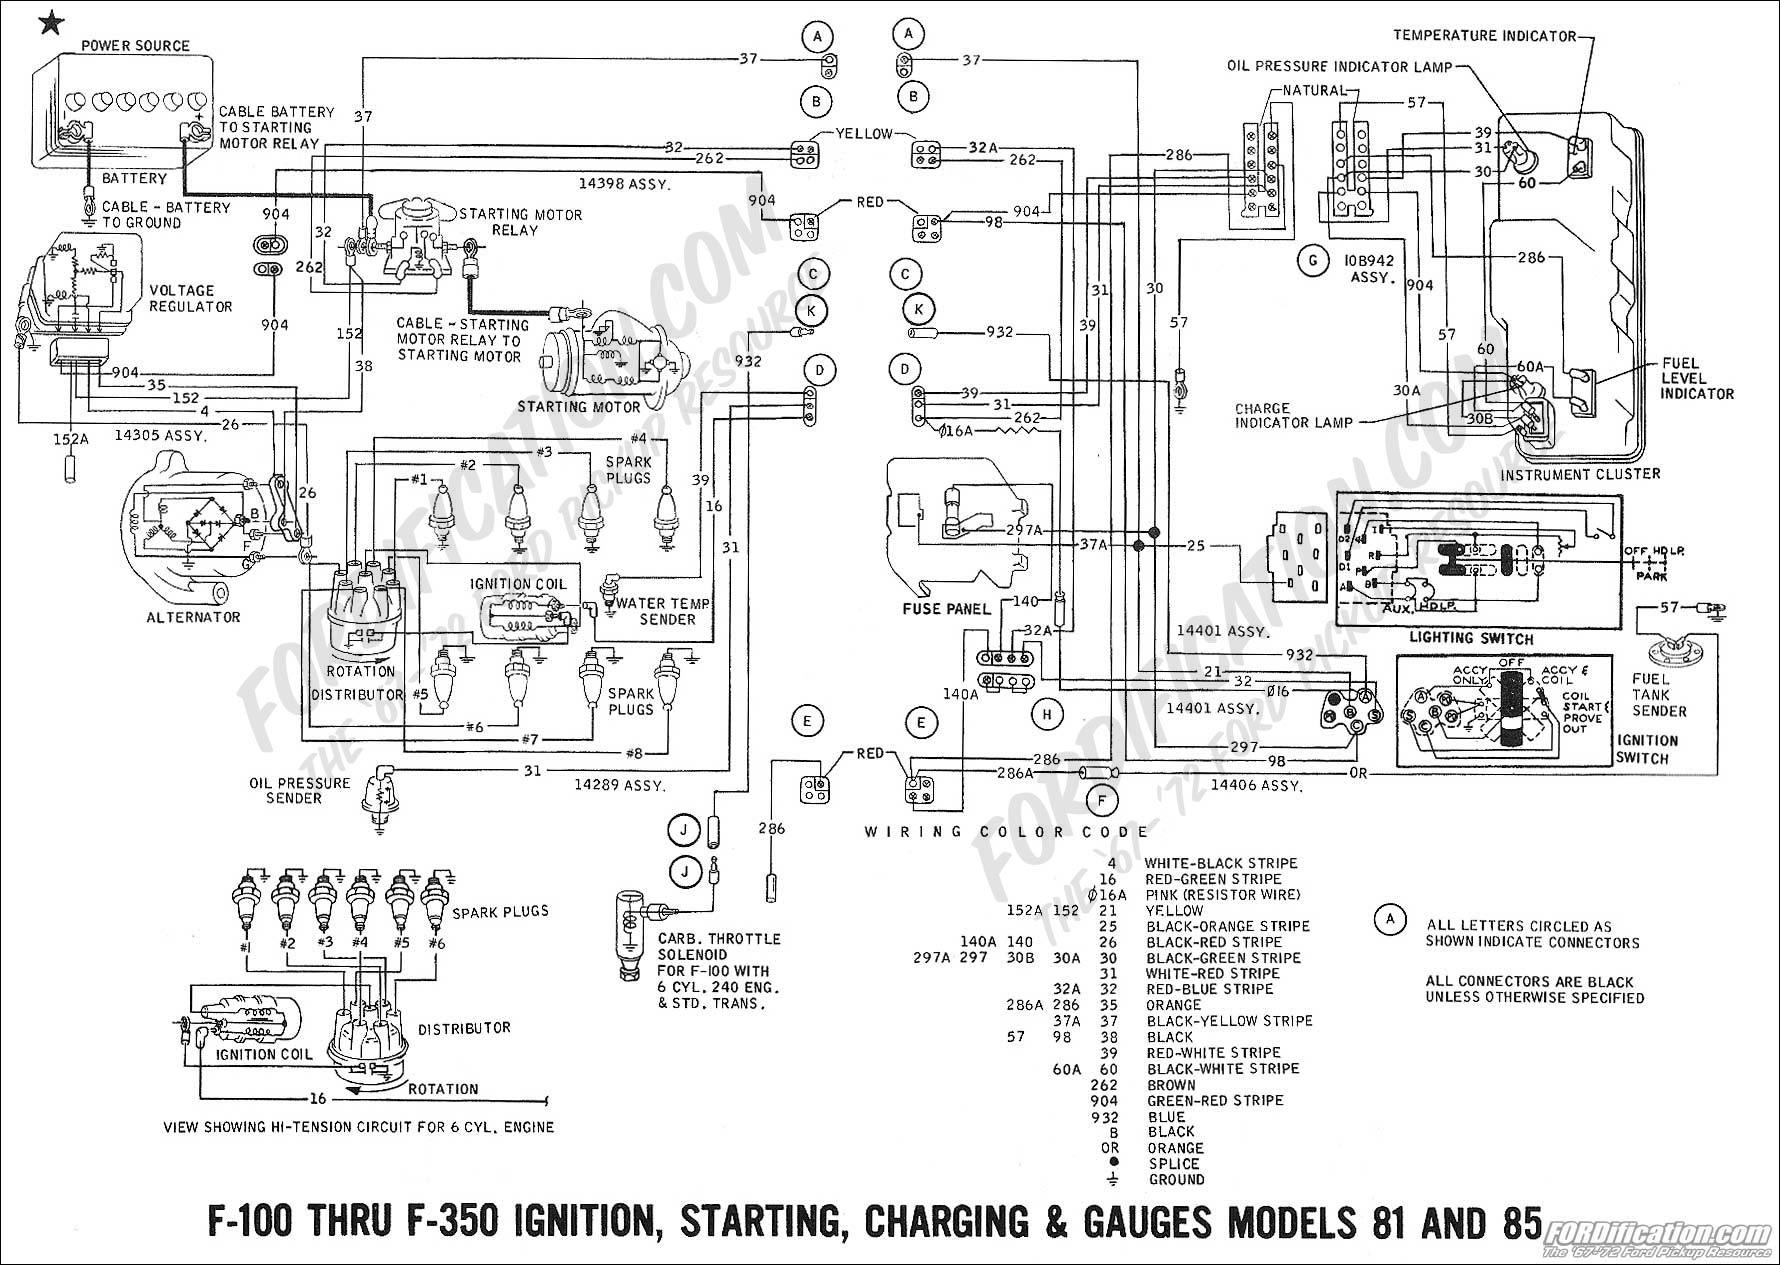 Electric Door Strike Wiring Diagram Caroldoey